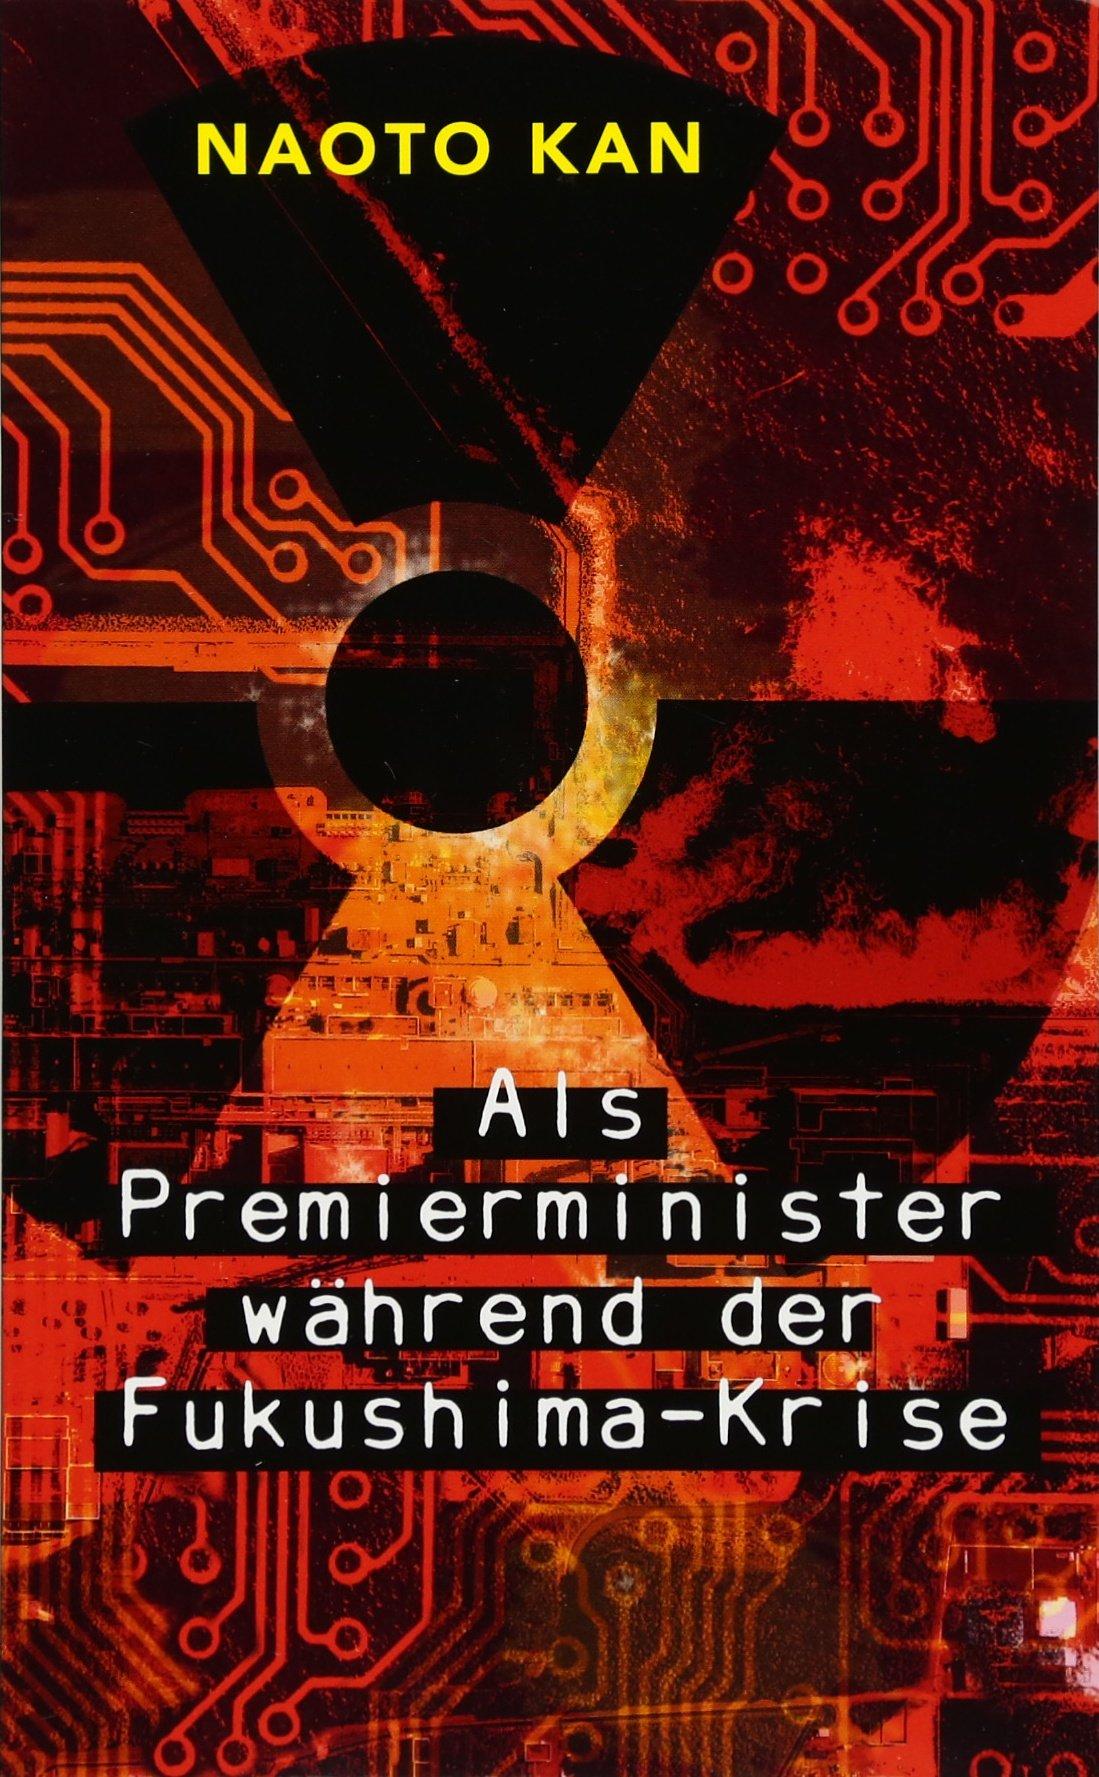 Als Premierminister während der Fukushima-Krise Taschenbuch – 20. Juli 2015 Naoto Kan Frank Rövekamp Iudicium 3862054268